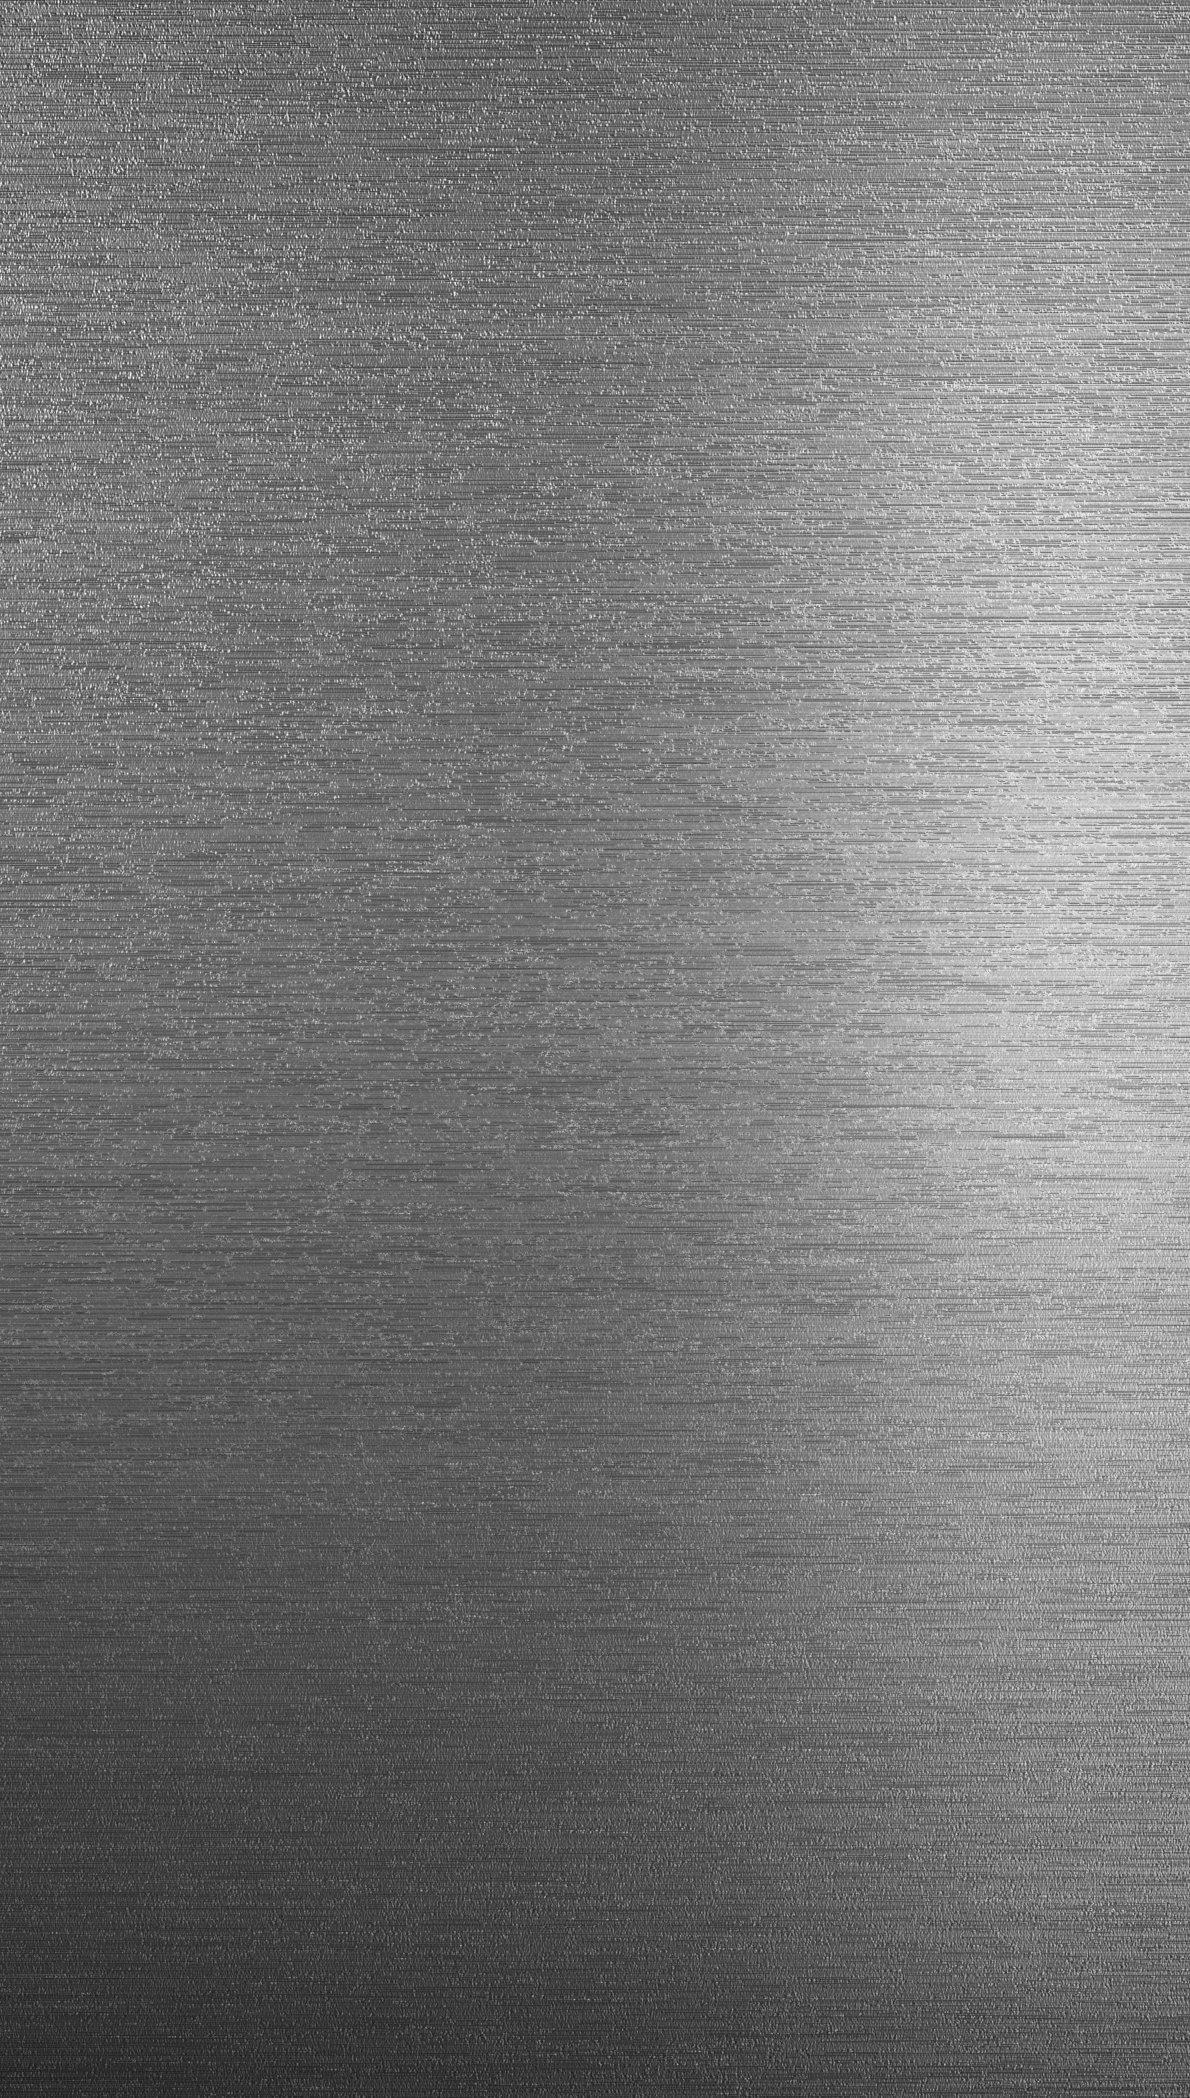 Wallpaper Metallic texture Vertical